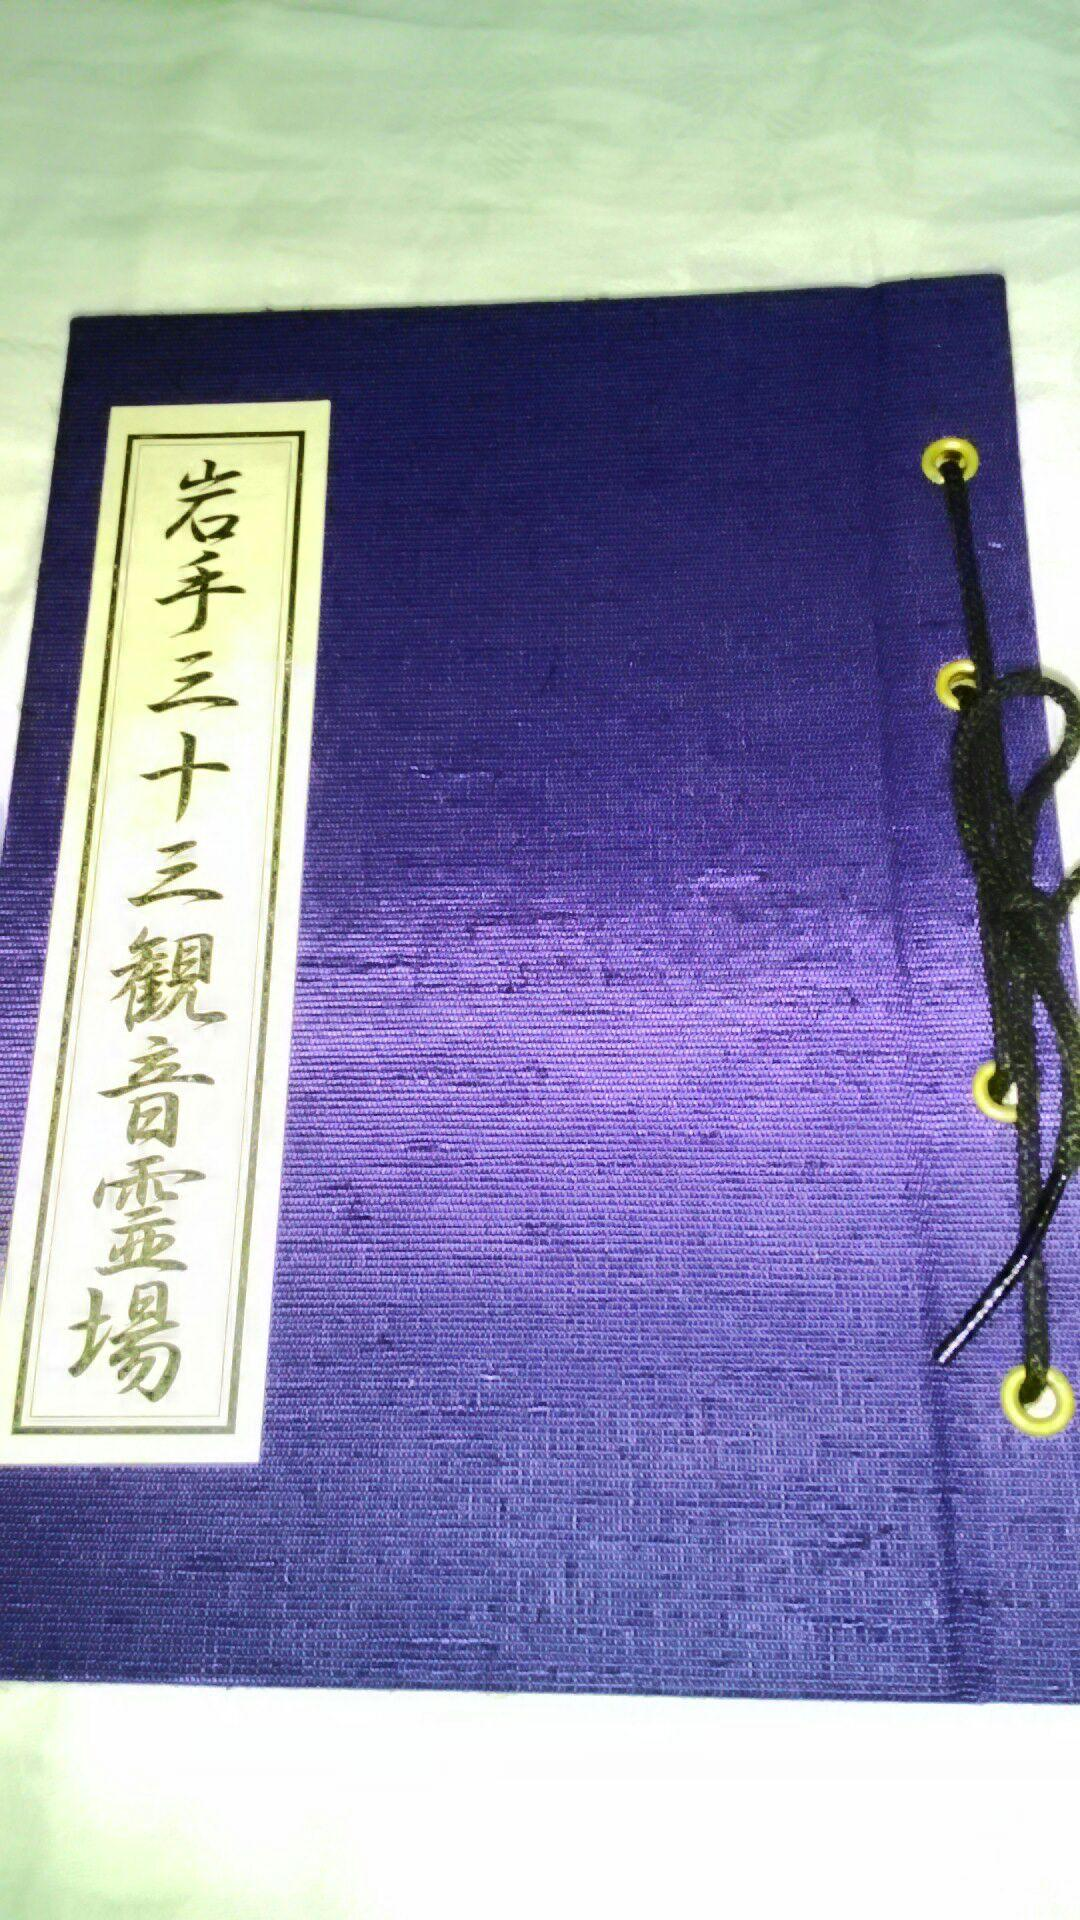 連正寺の御朱印帳